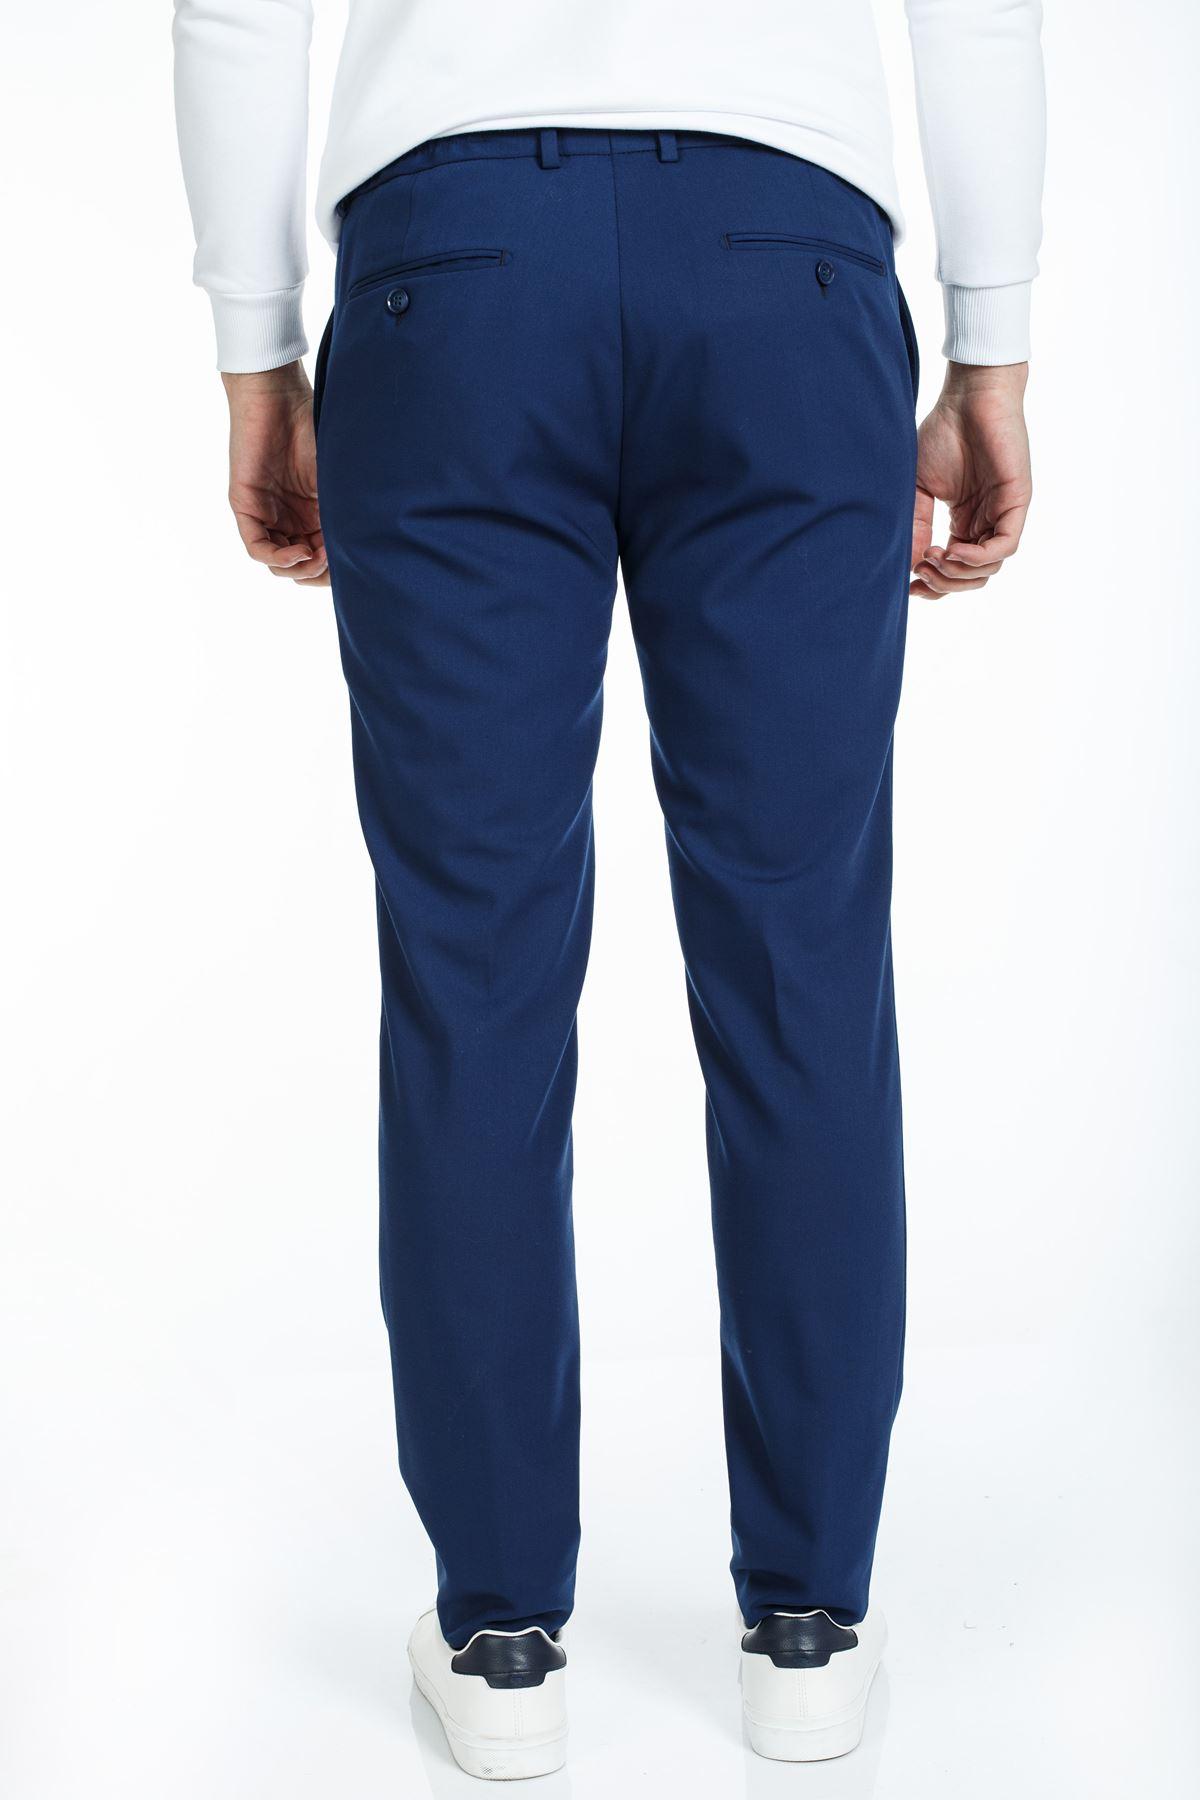 Parlament Süper Slim Kalıp Jogger Pantolon